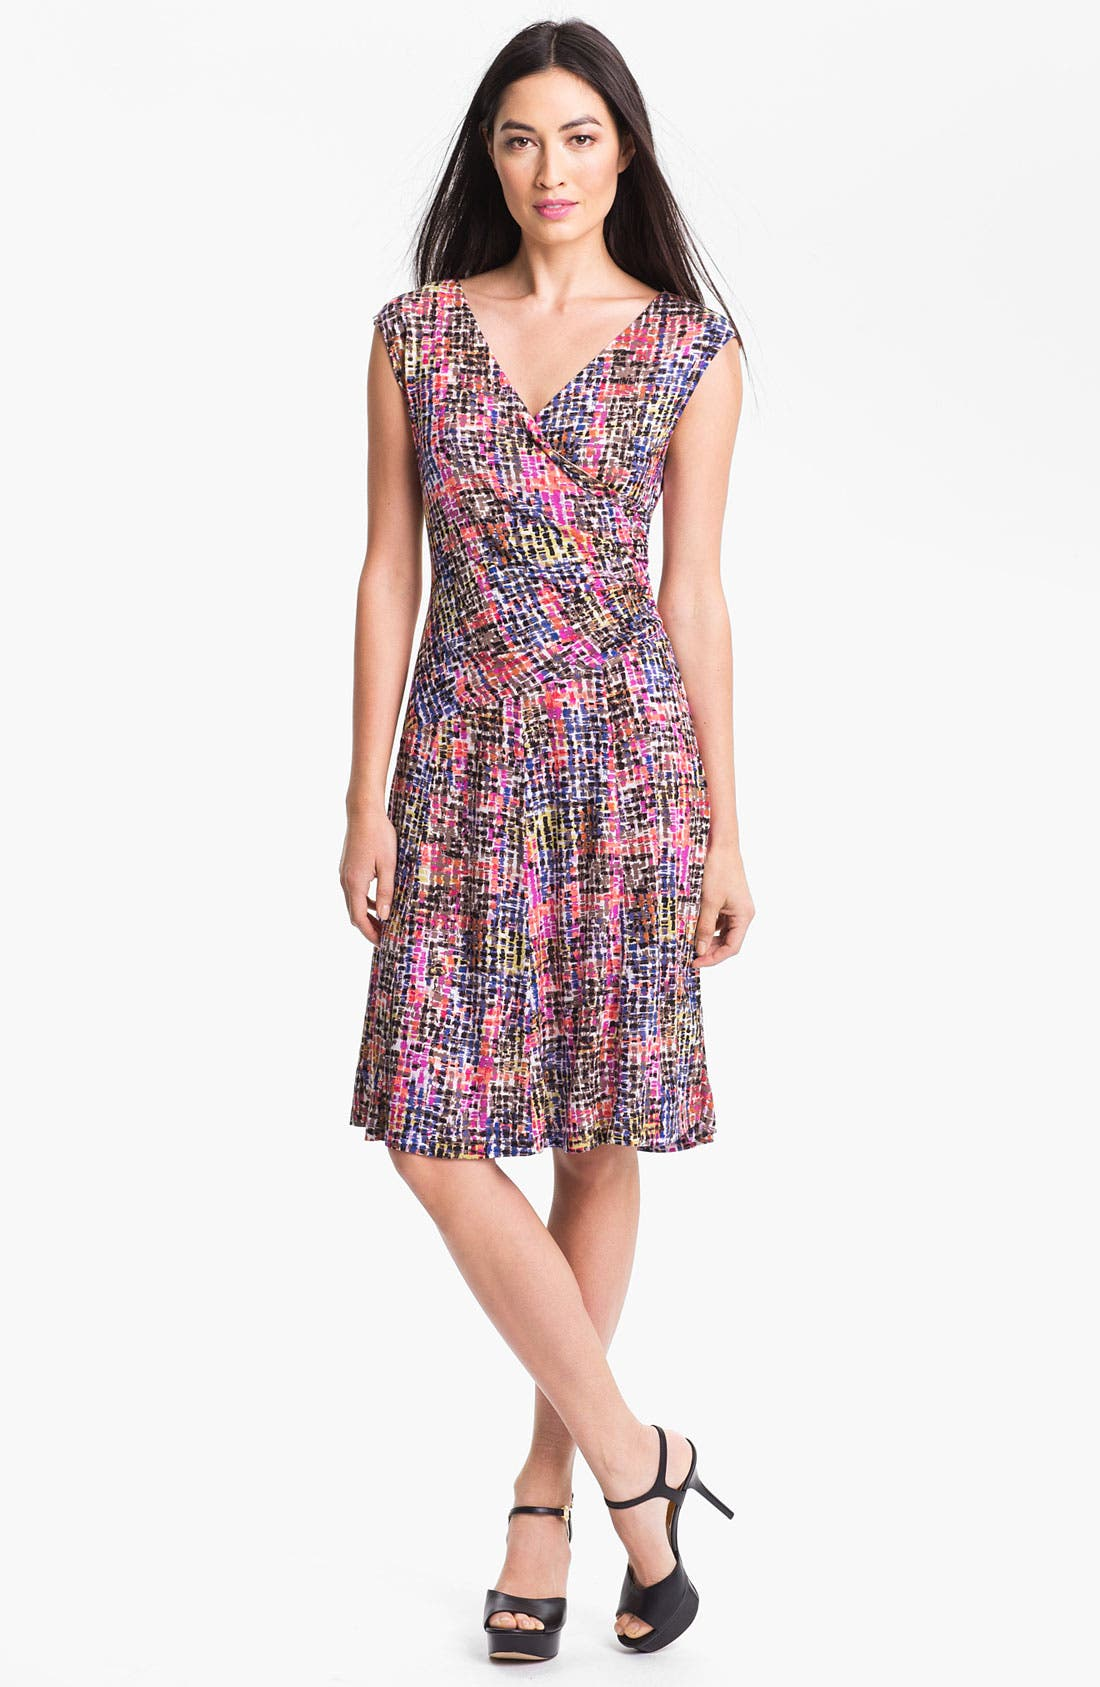 Alternate Image 1 Selected - Nic + Zoe 'Tiny Squares' Dress